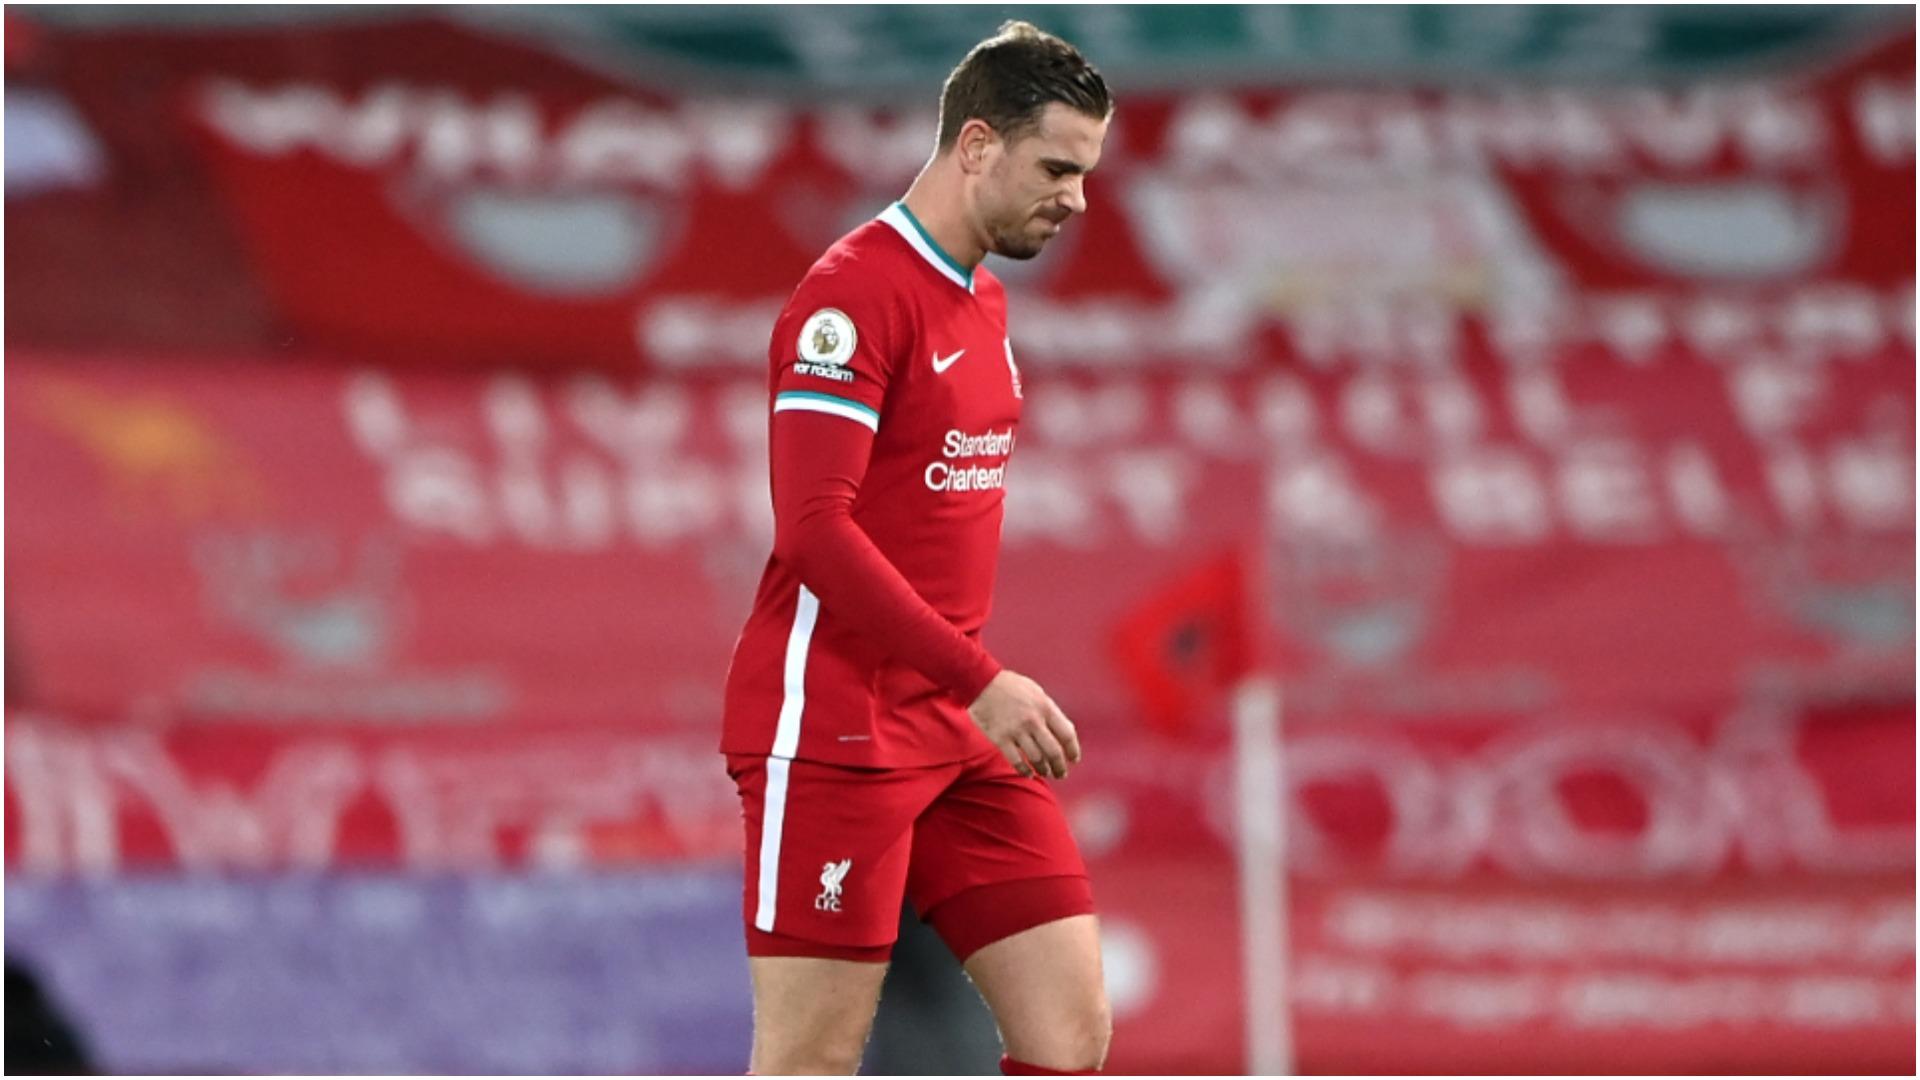 Liverpool captain Henderson out until April following surgery